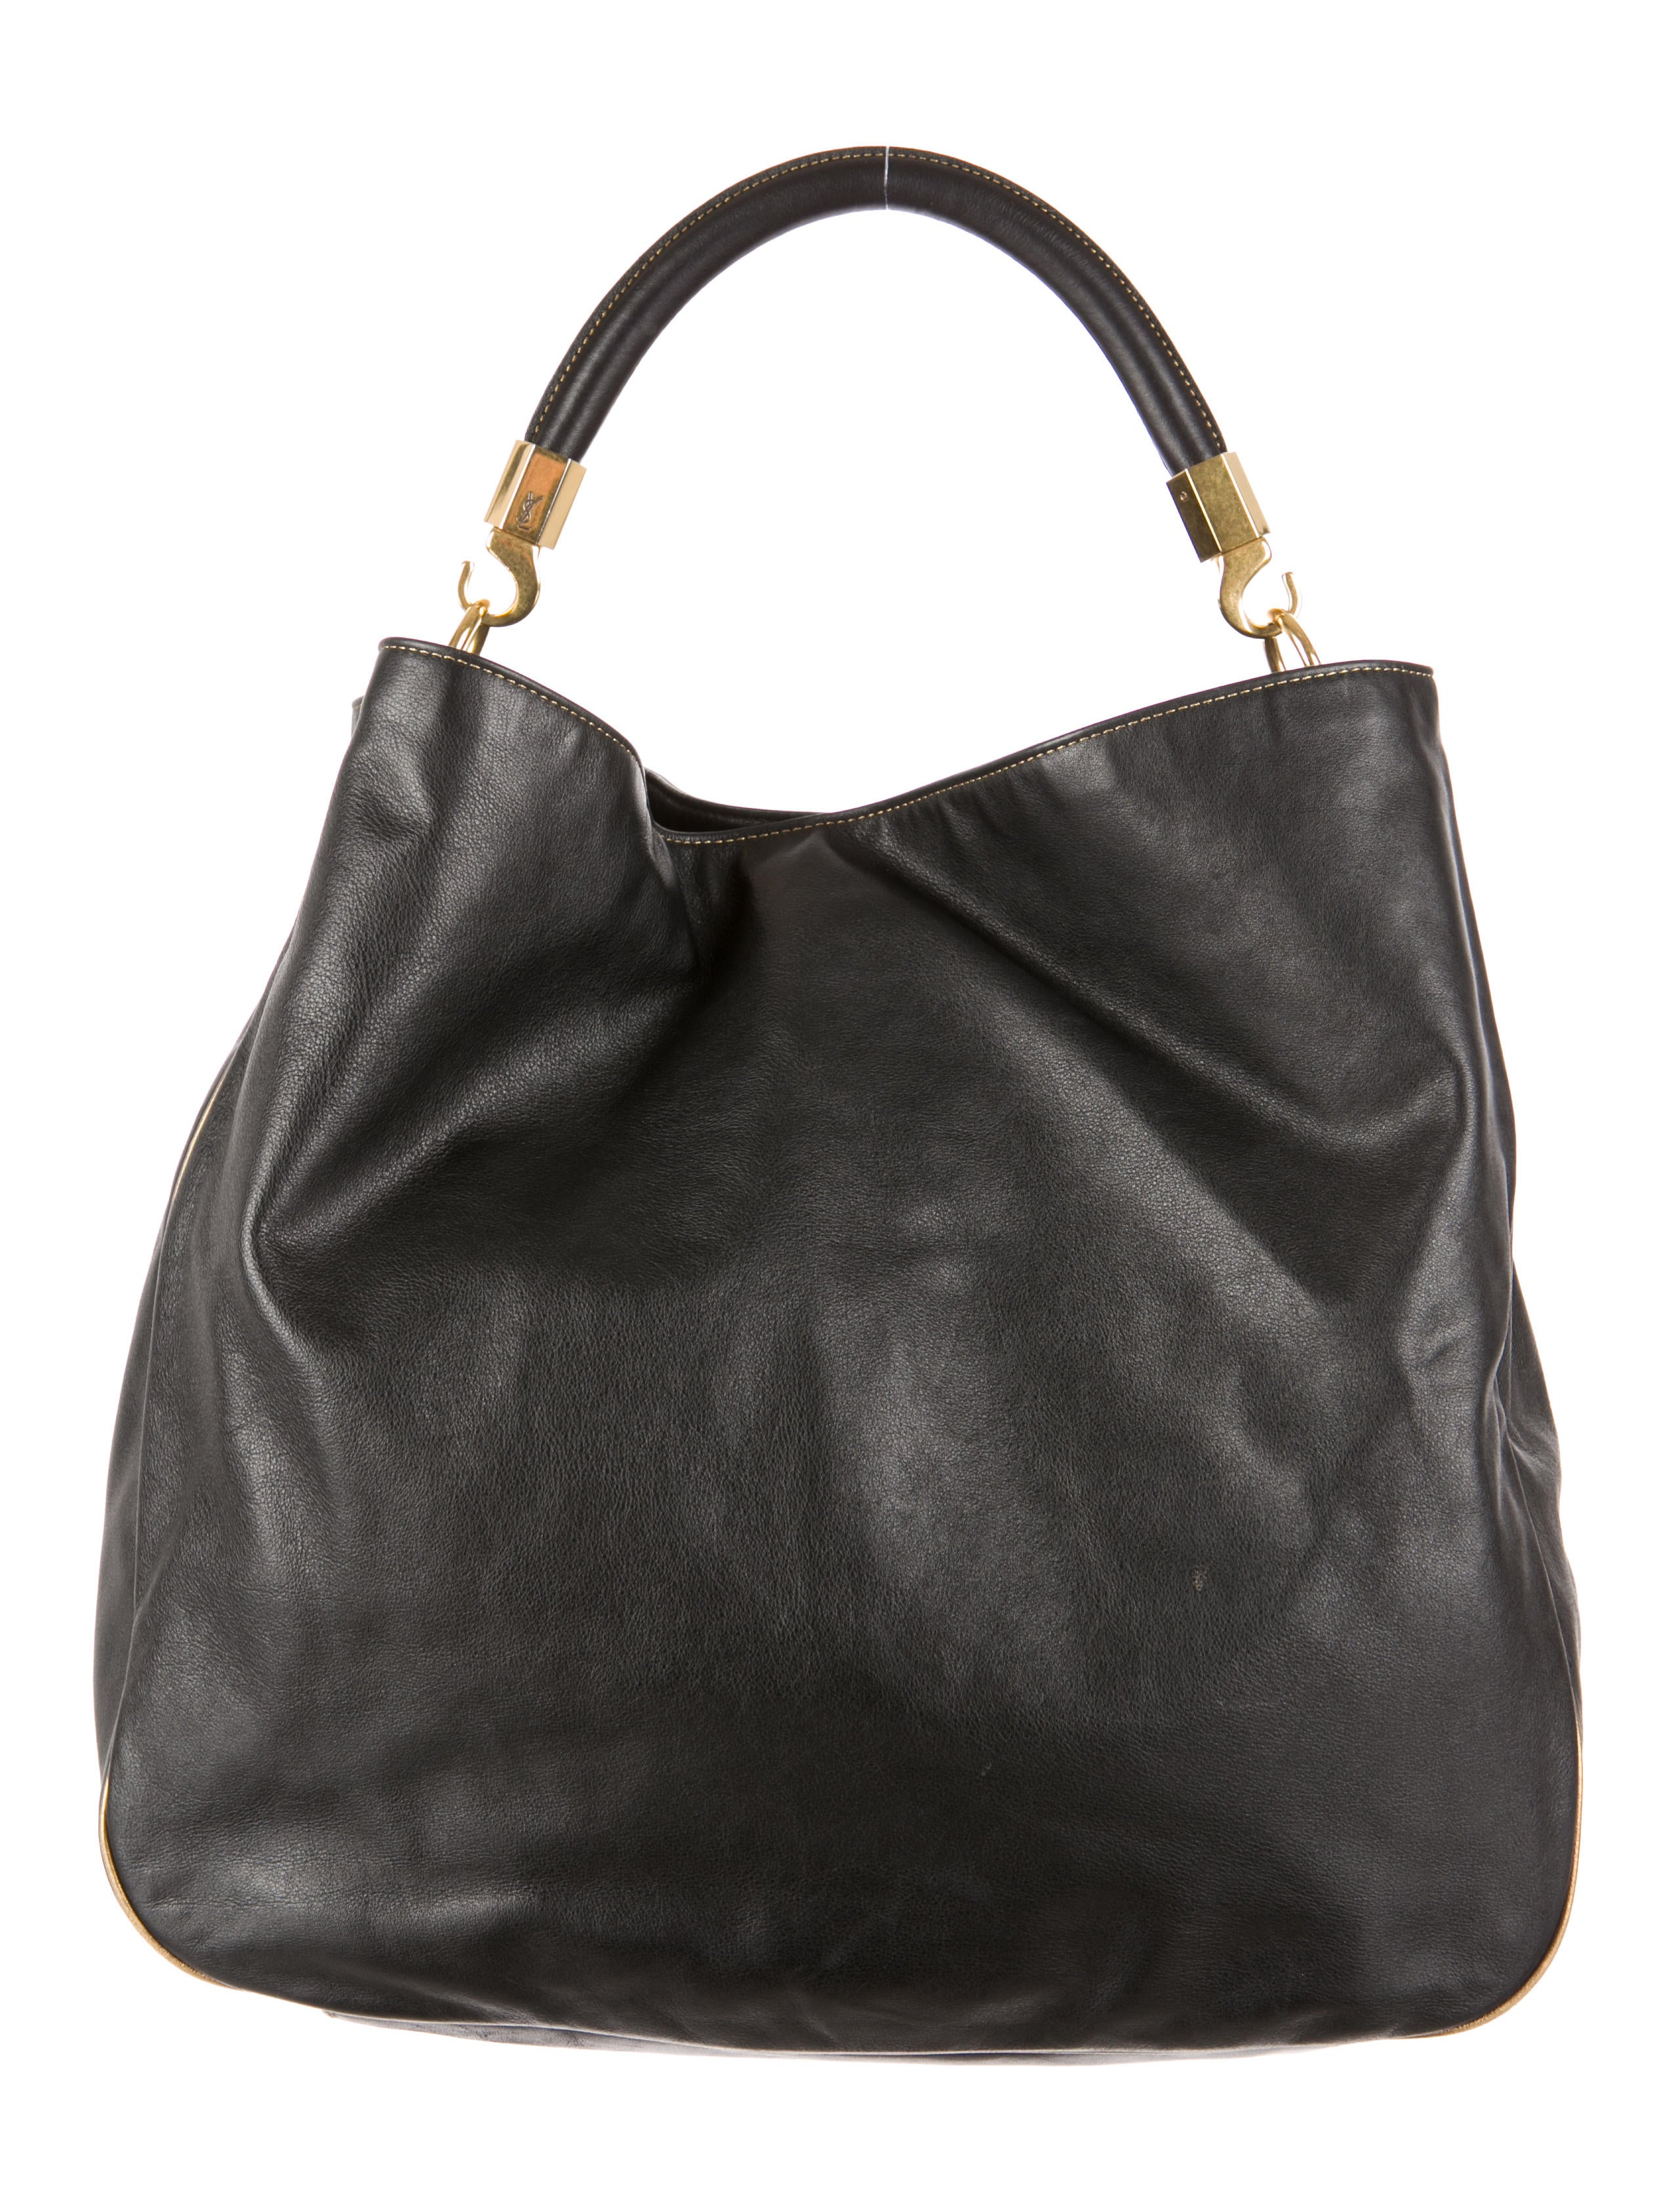 Yves Saint Laurent Roady Hobo - Handbags - YVE32331 | The RealReal